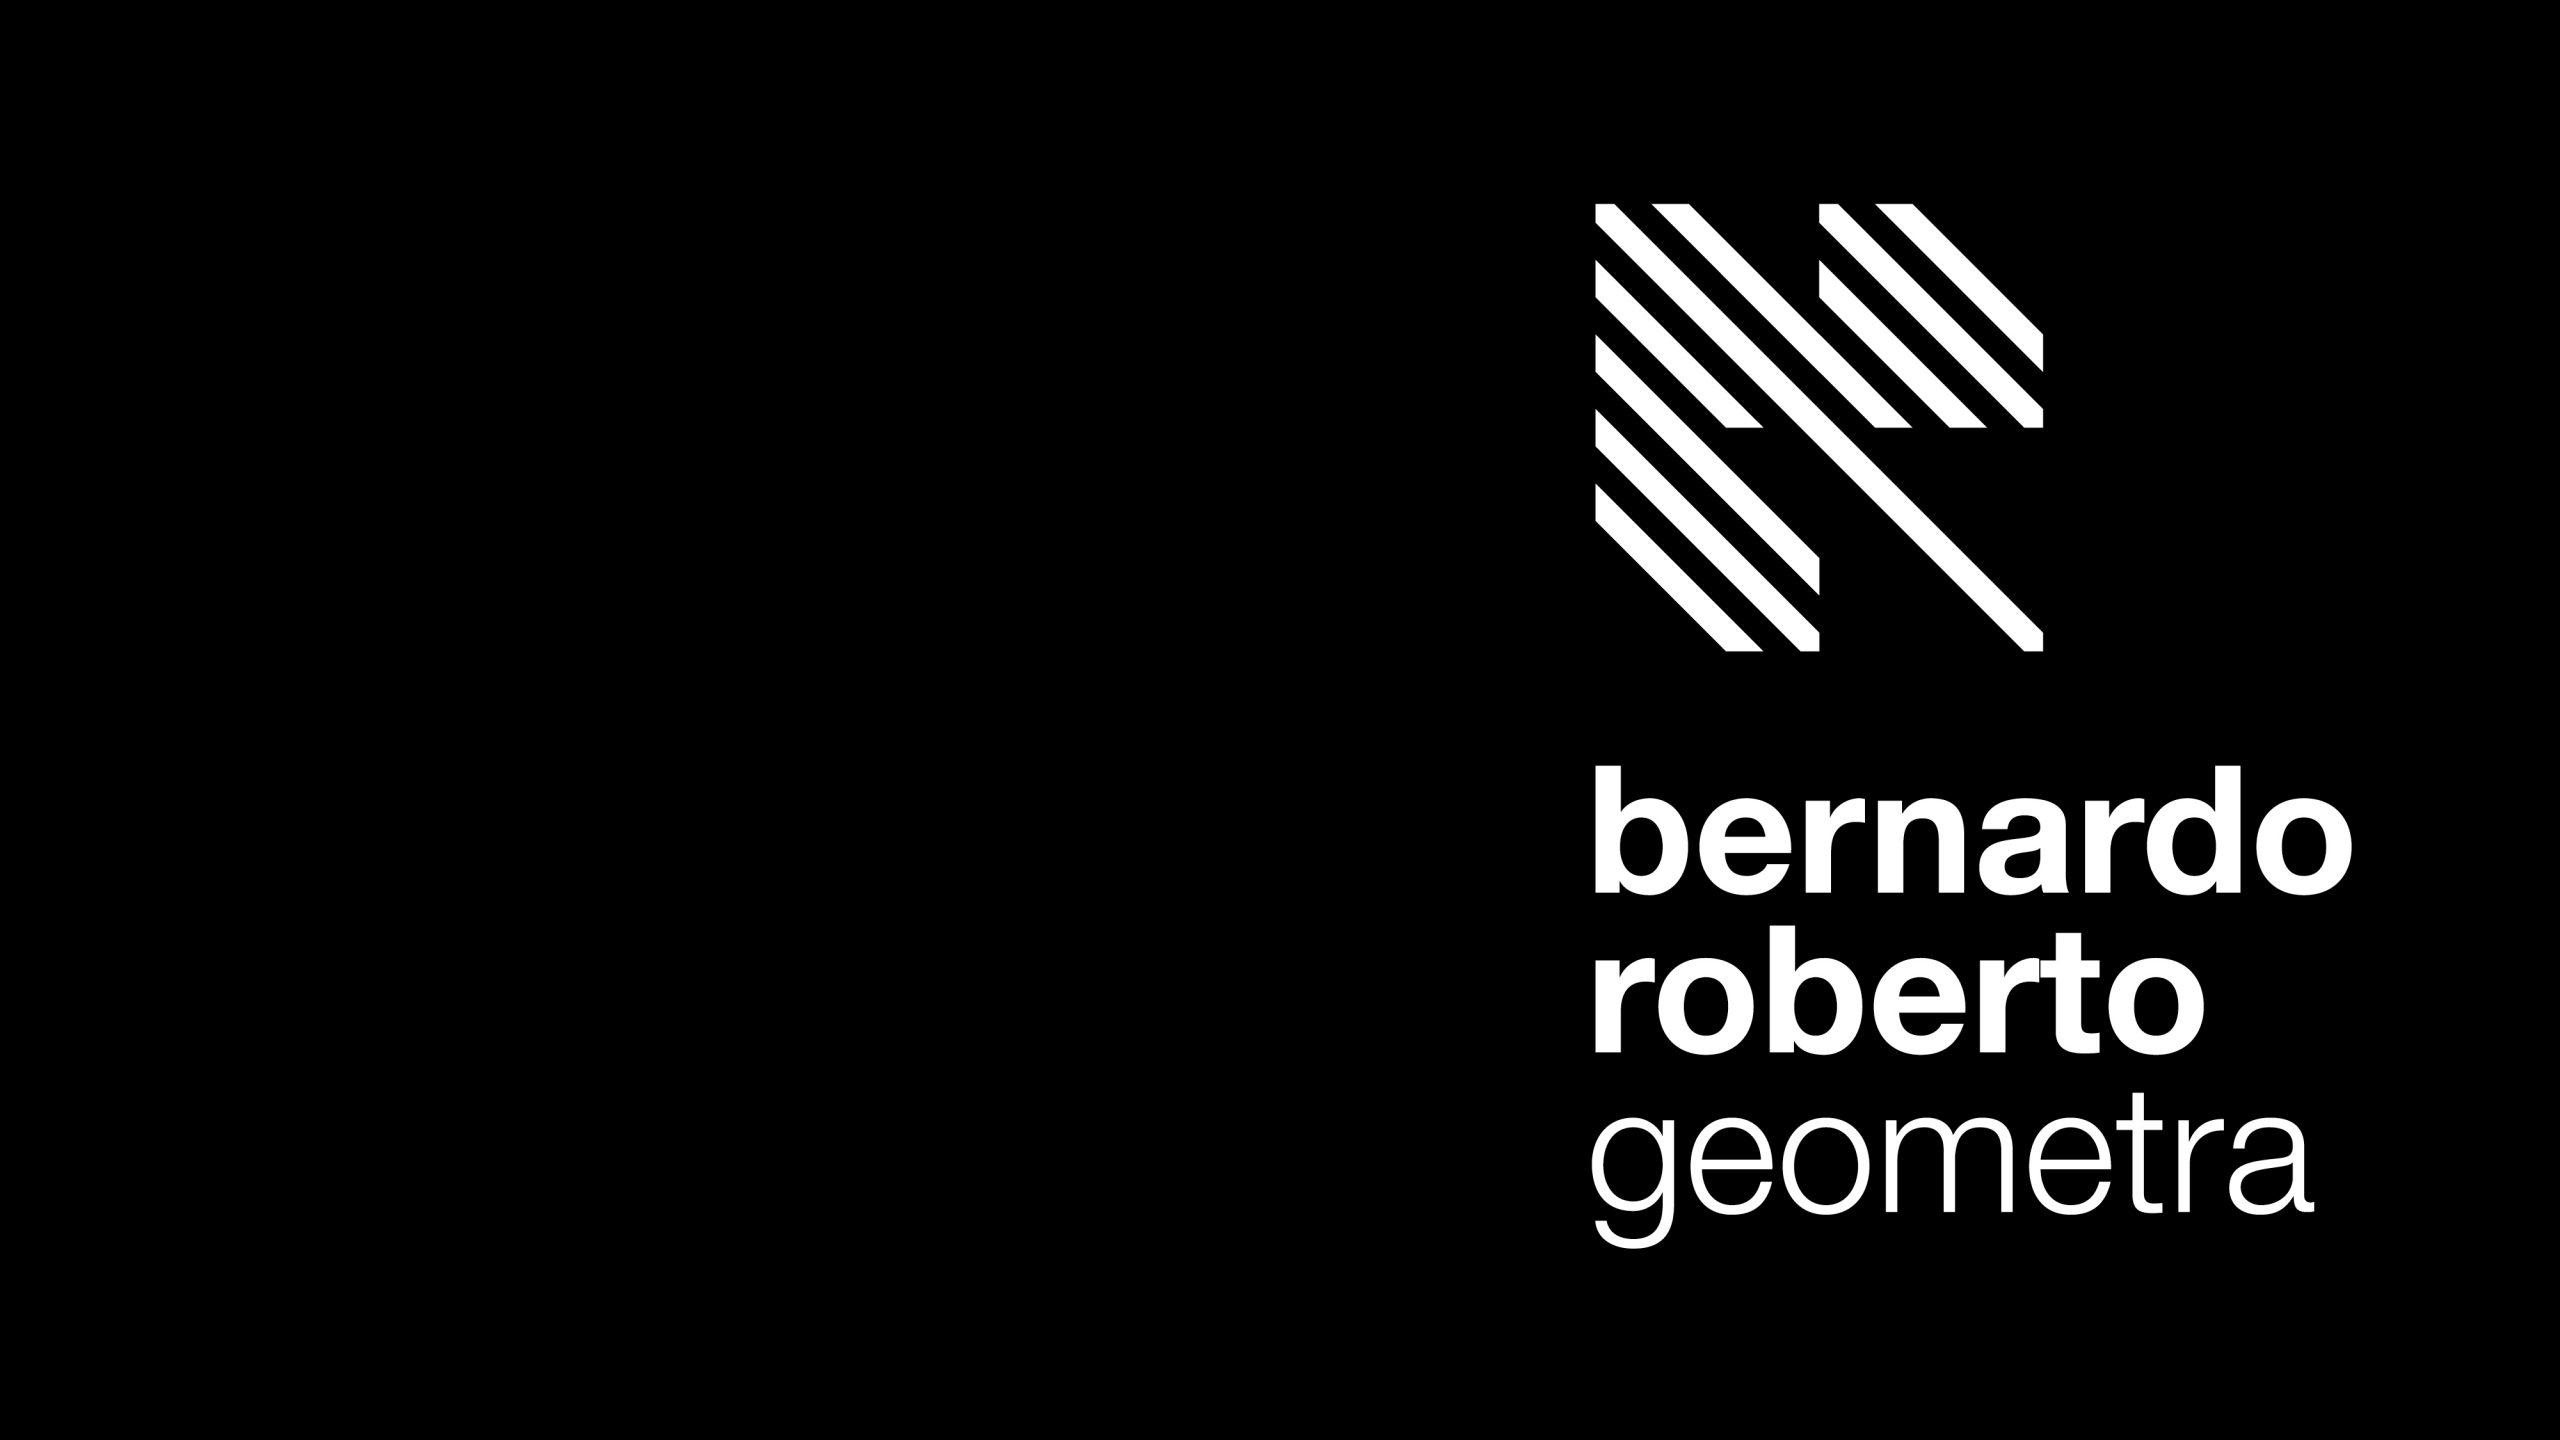 goomlab-bernardo-geometra-3